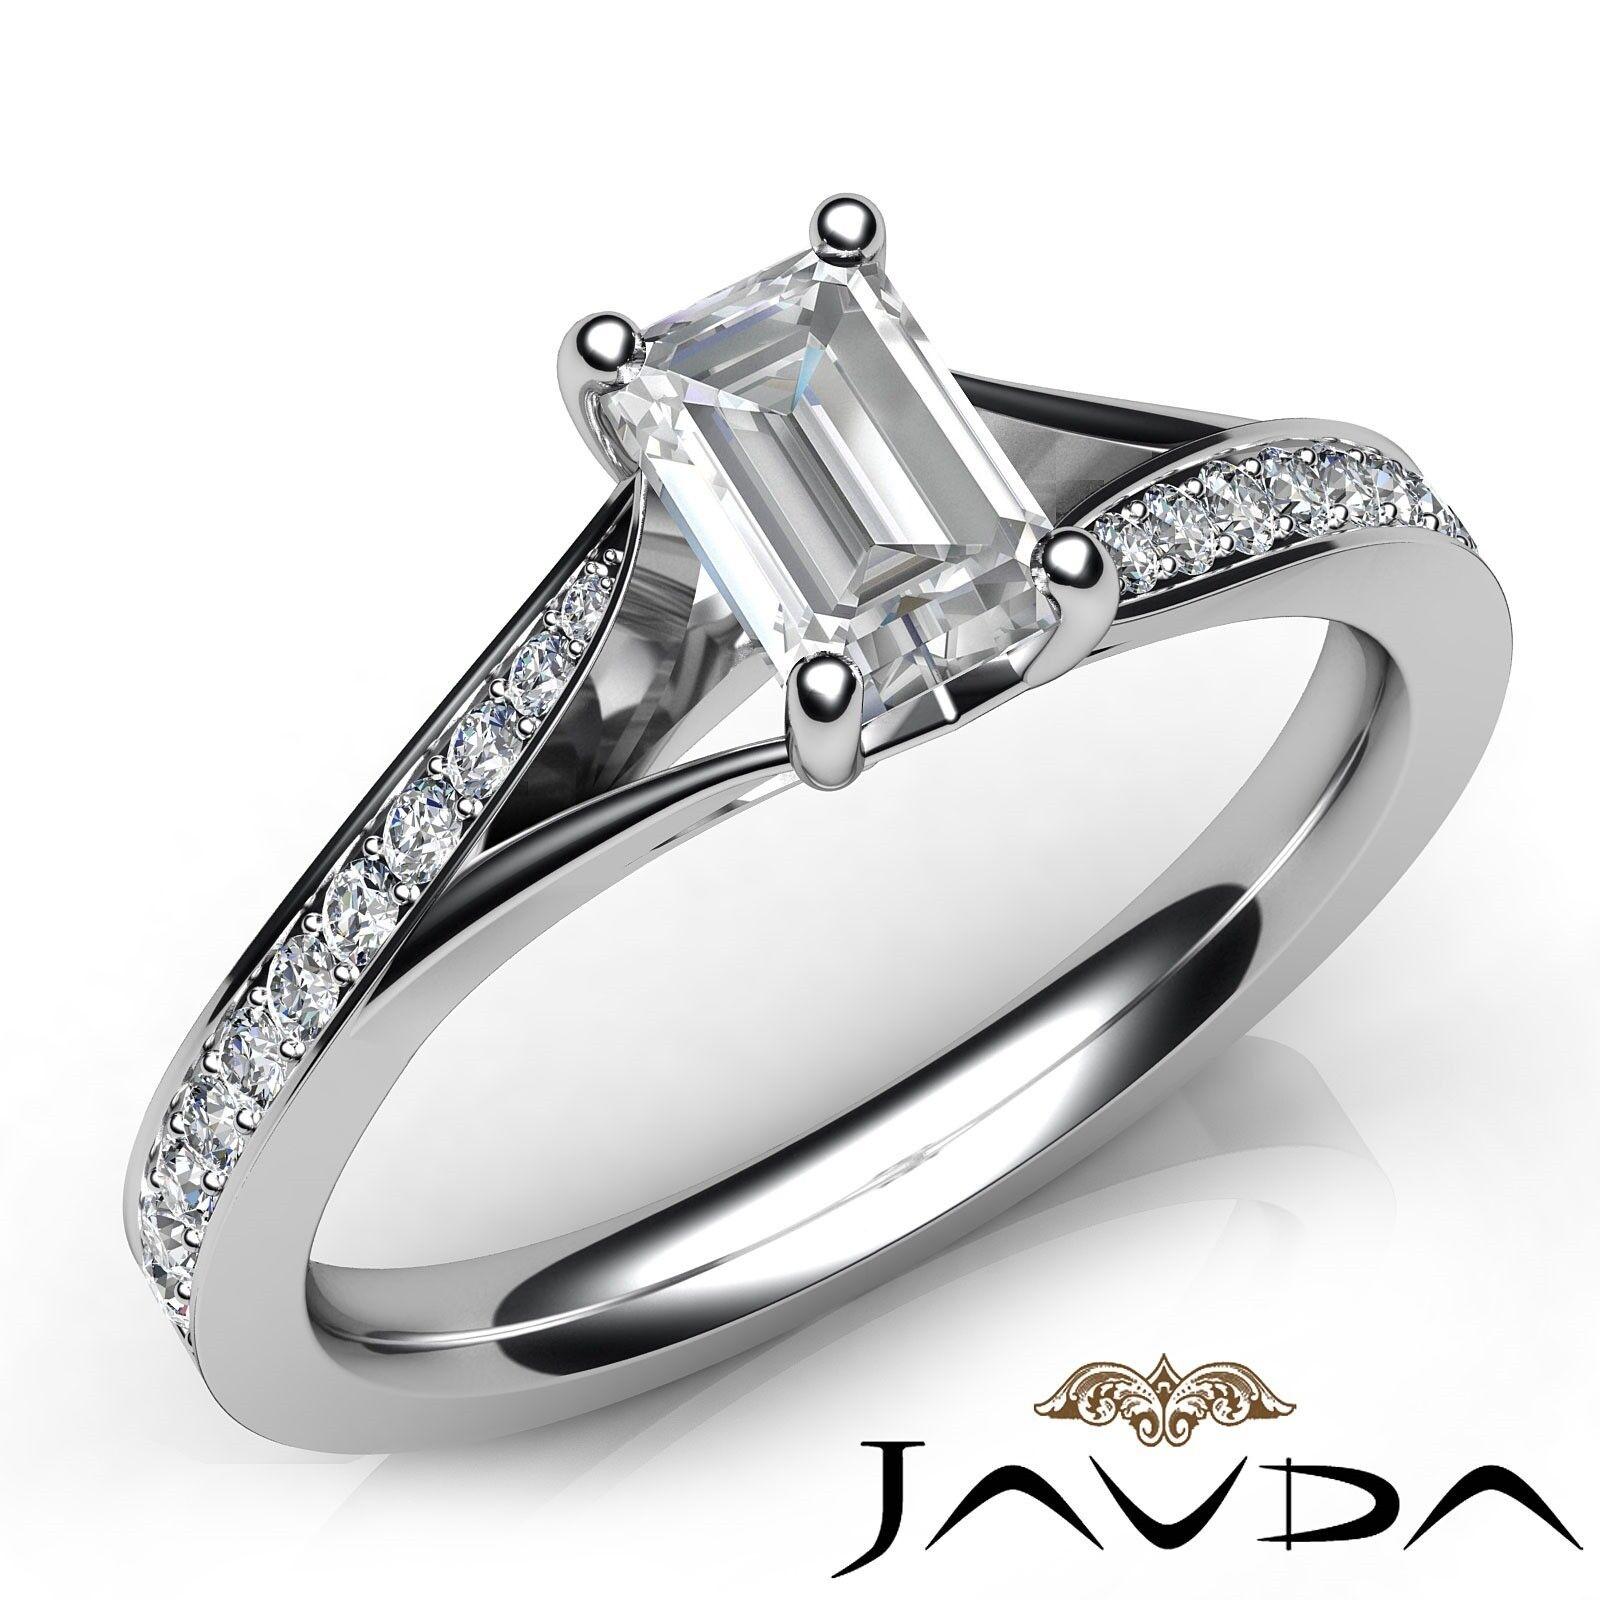 0.85ctw Classic Pave Set Emerald Diamond Engagement Ring GIA E-VS1 White Gold